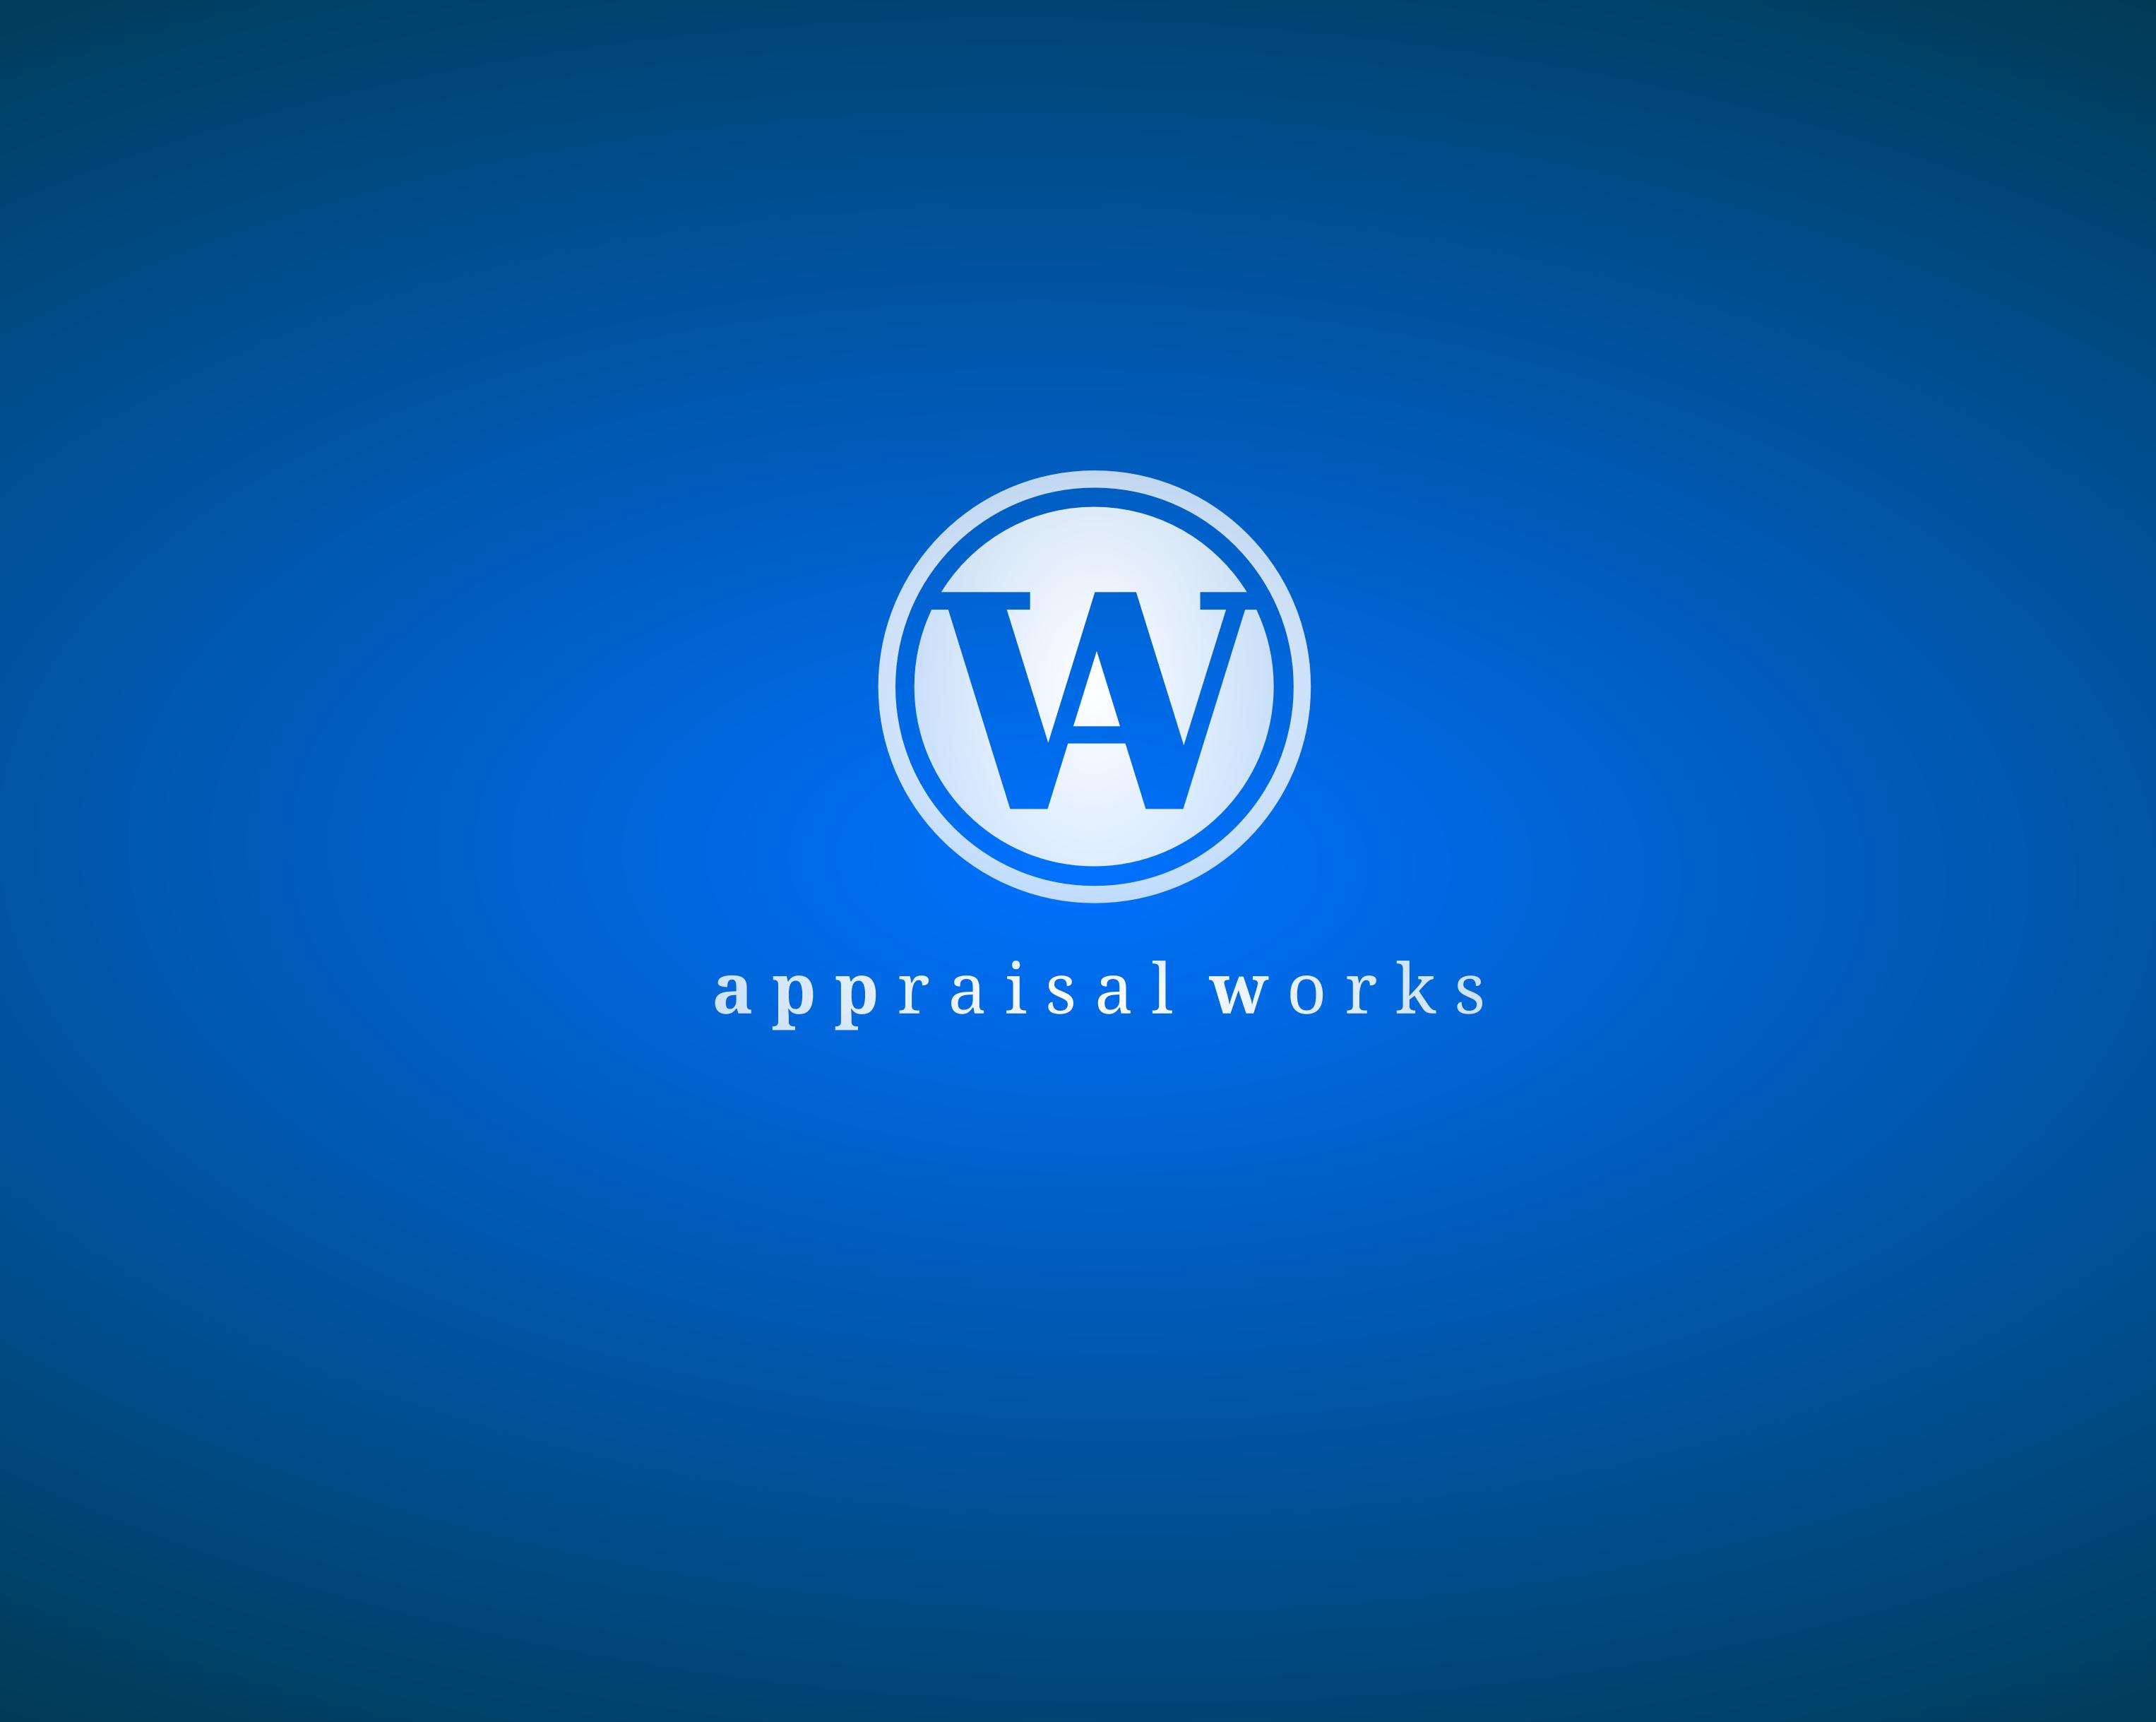 Logo Design by JaroslavProcka - Entry No. 135 in the Logo Design Contest Appraisal Works Logo Design.